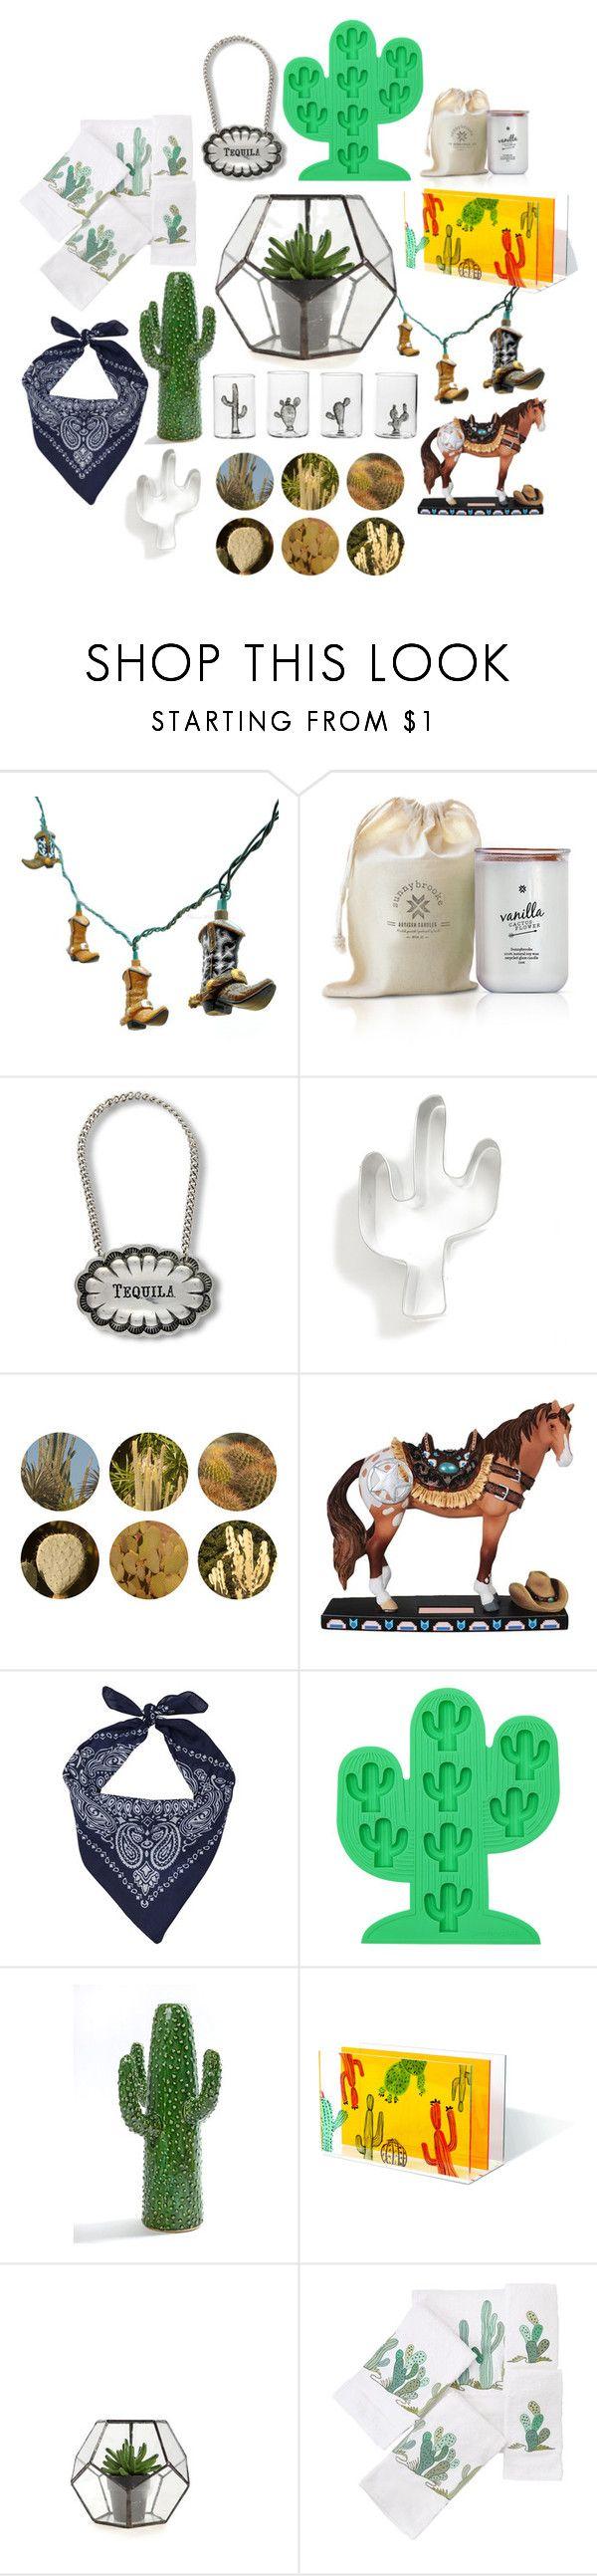 """Wild Westmas"" by brandnewjen ❤ liked on Polyvore featuring interior, interiors, interior design, home, home decor, interior decorating, Vagabond House, Ann Clark, Ella Doran and Westland Giftware"